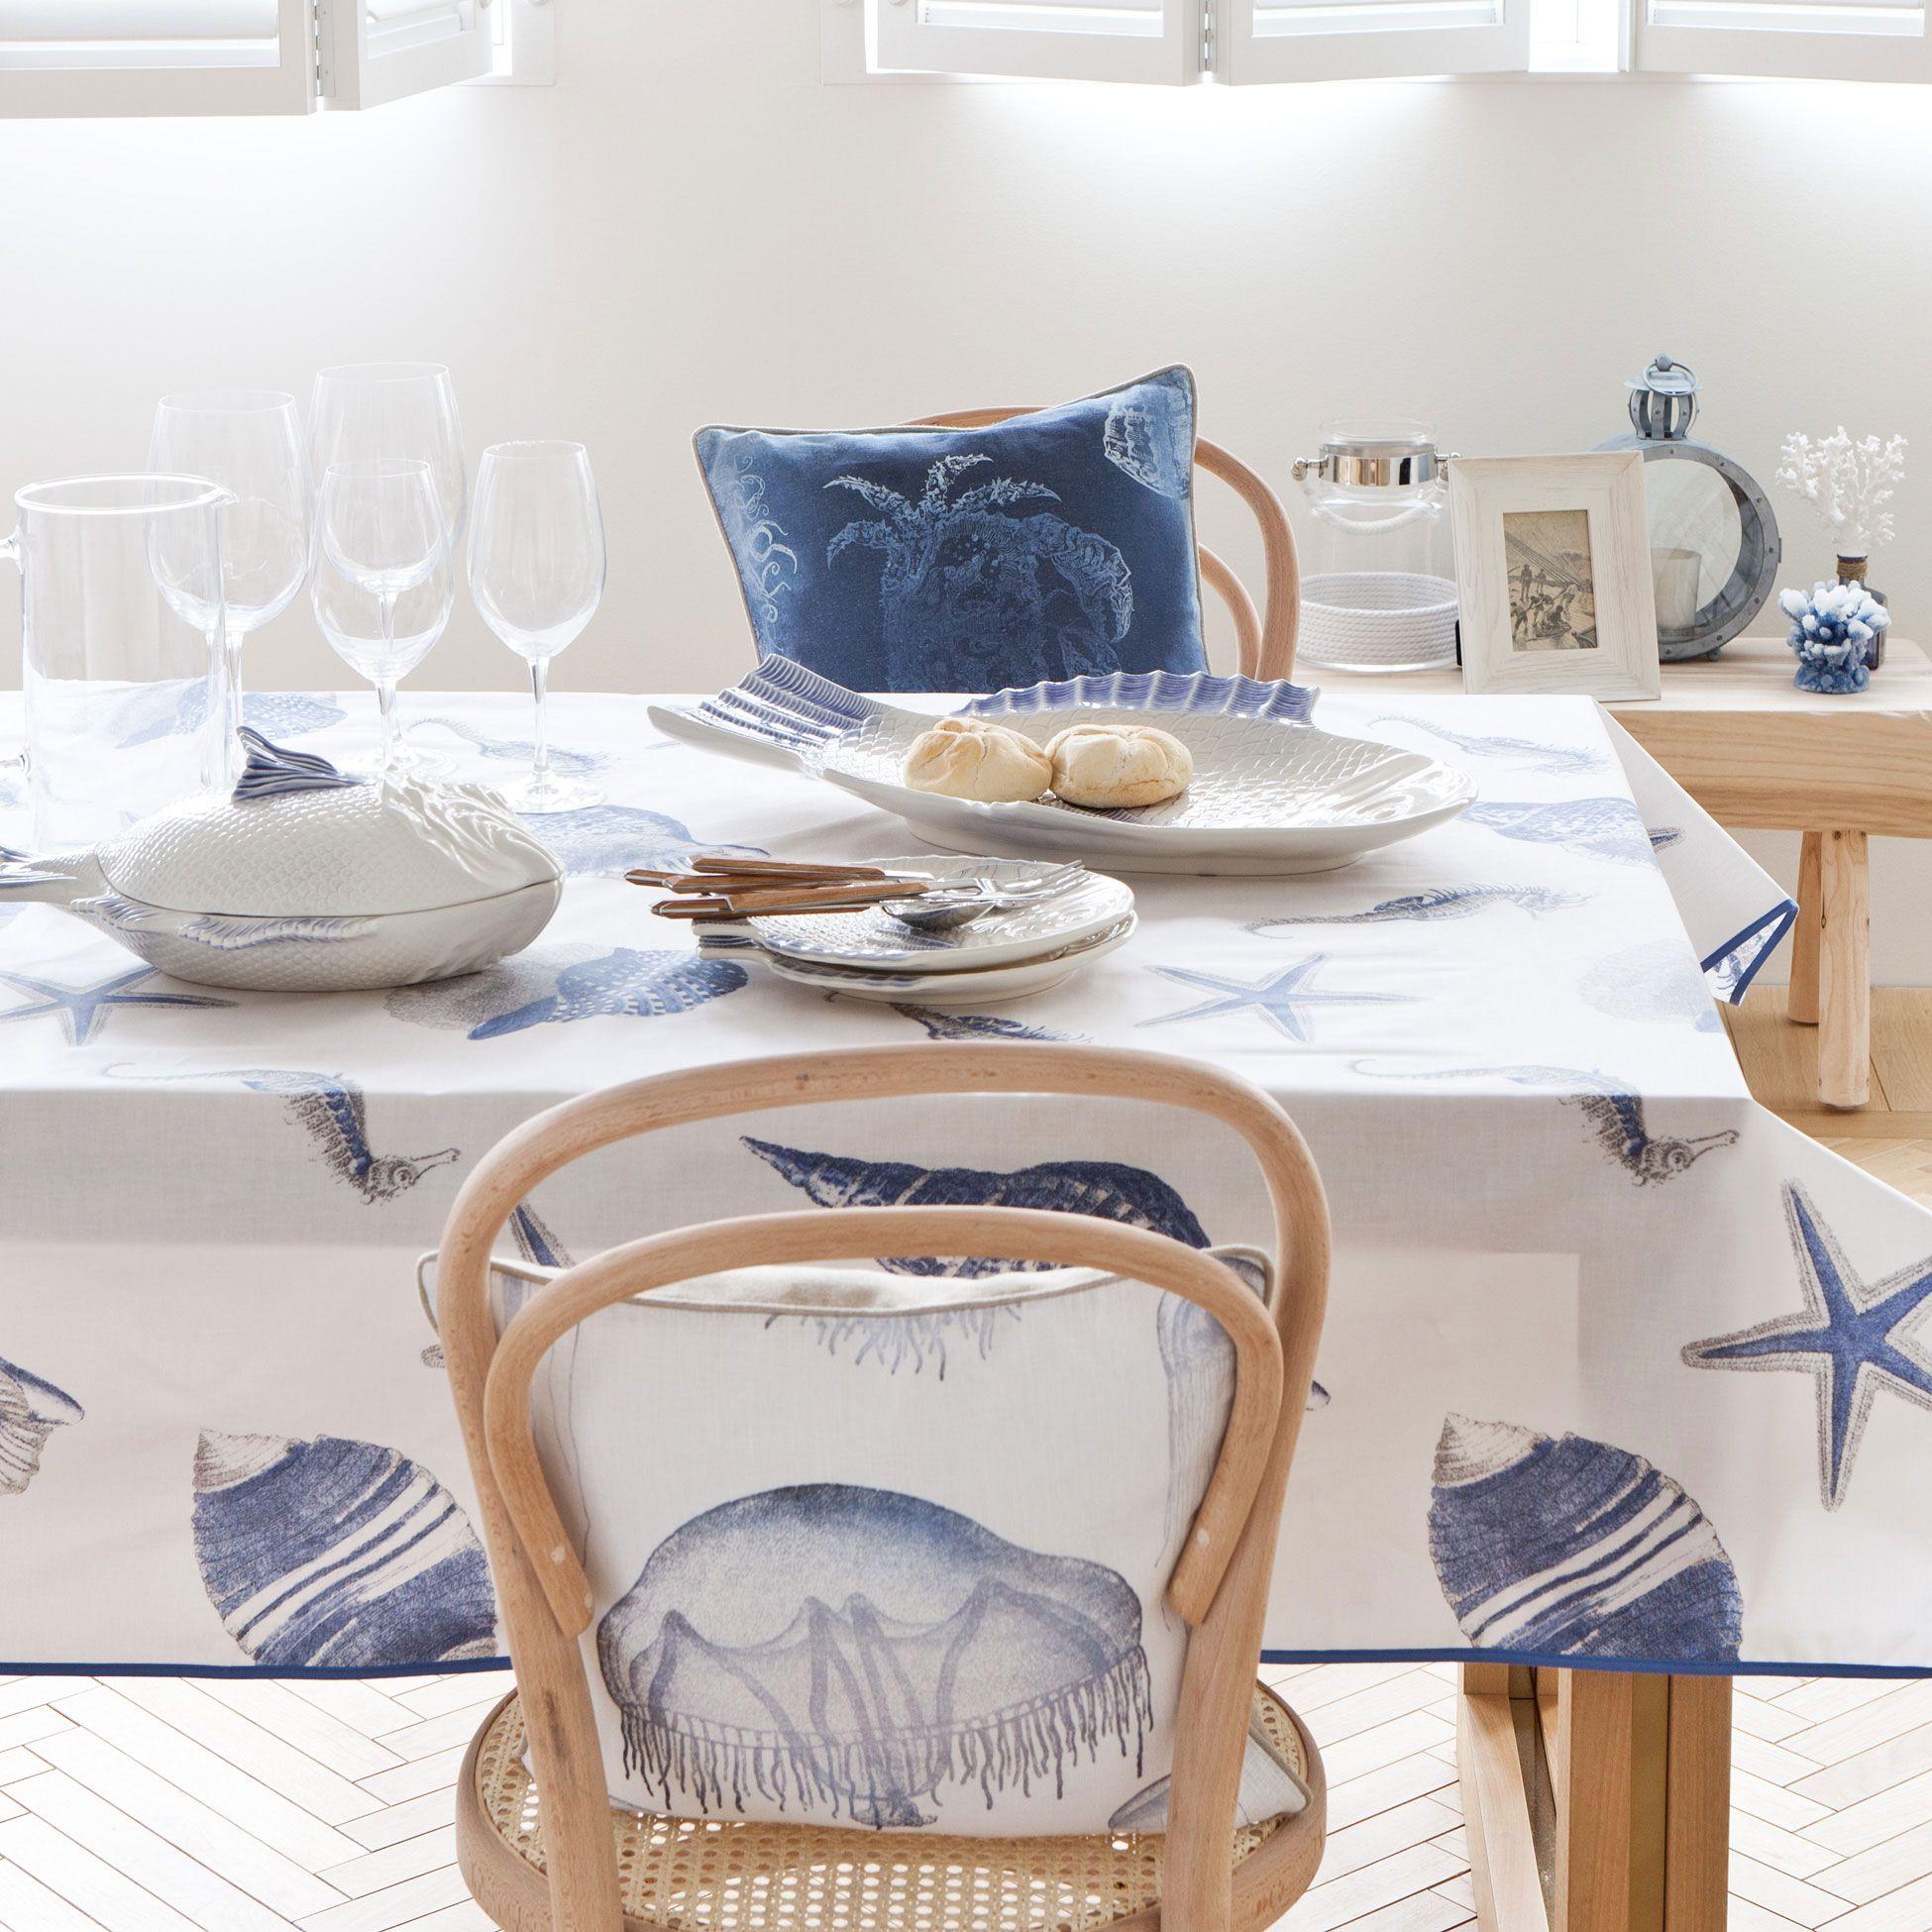 MARINE MOTIF PLASTIC-COATED TABLECLOTH - Tablecloths \u0026 Napkins - Tableware | Zara Home United & MARINE MOTIF PLASTIC-COATED TABLECLOTH - Tablecloths \u0026 Napkins ...